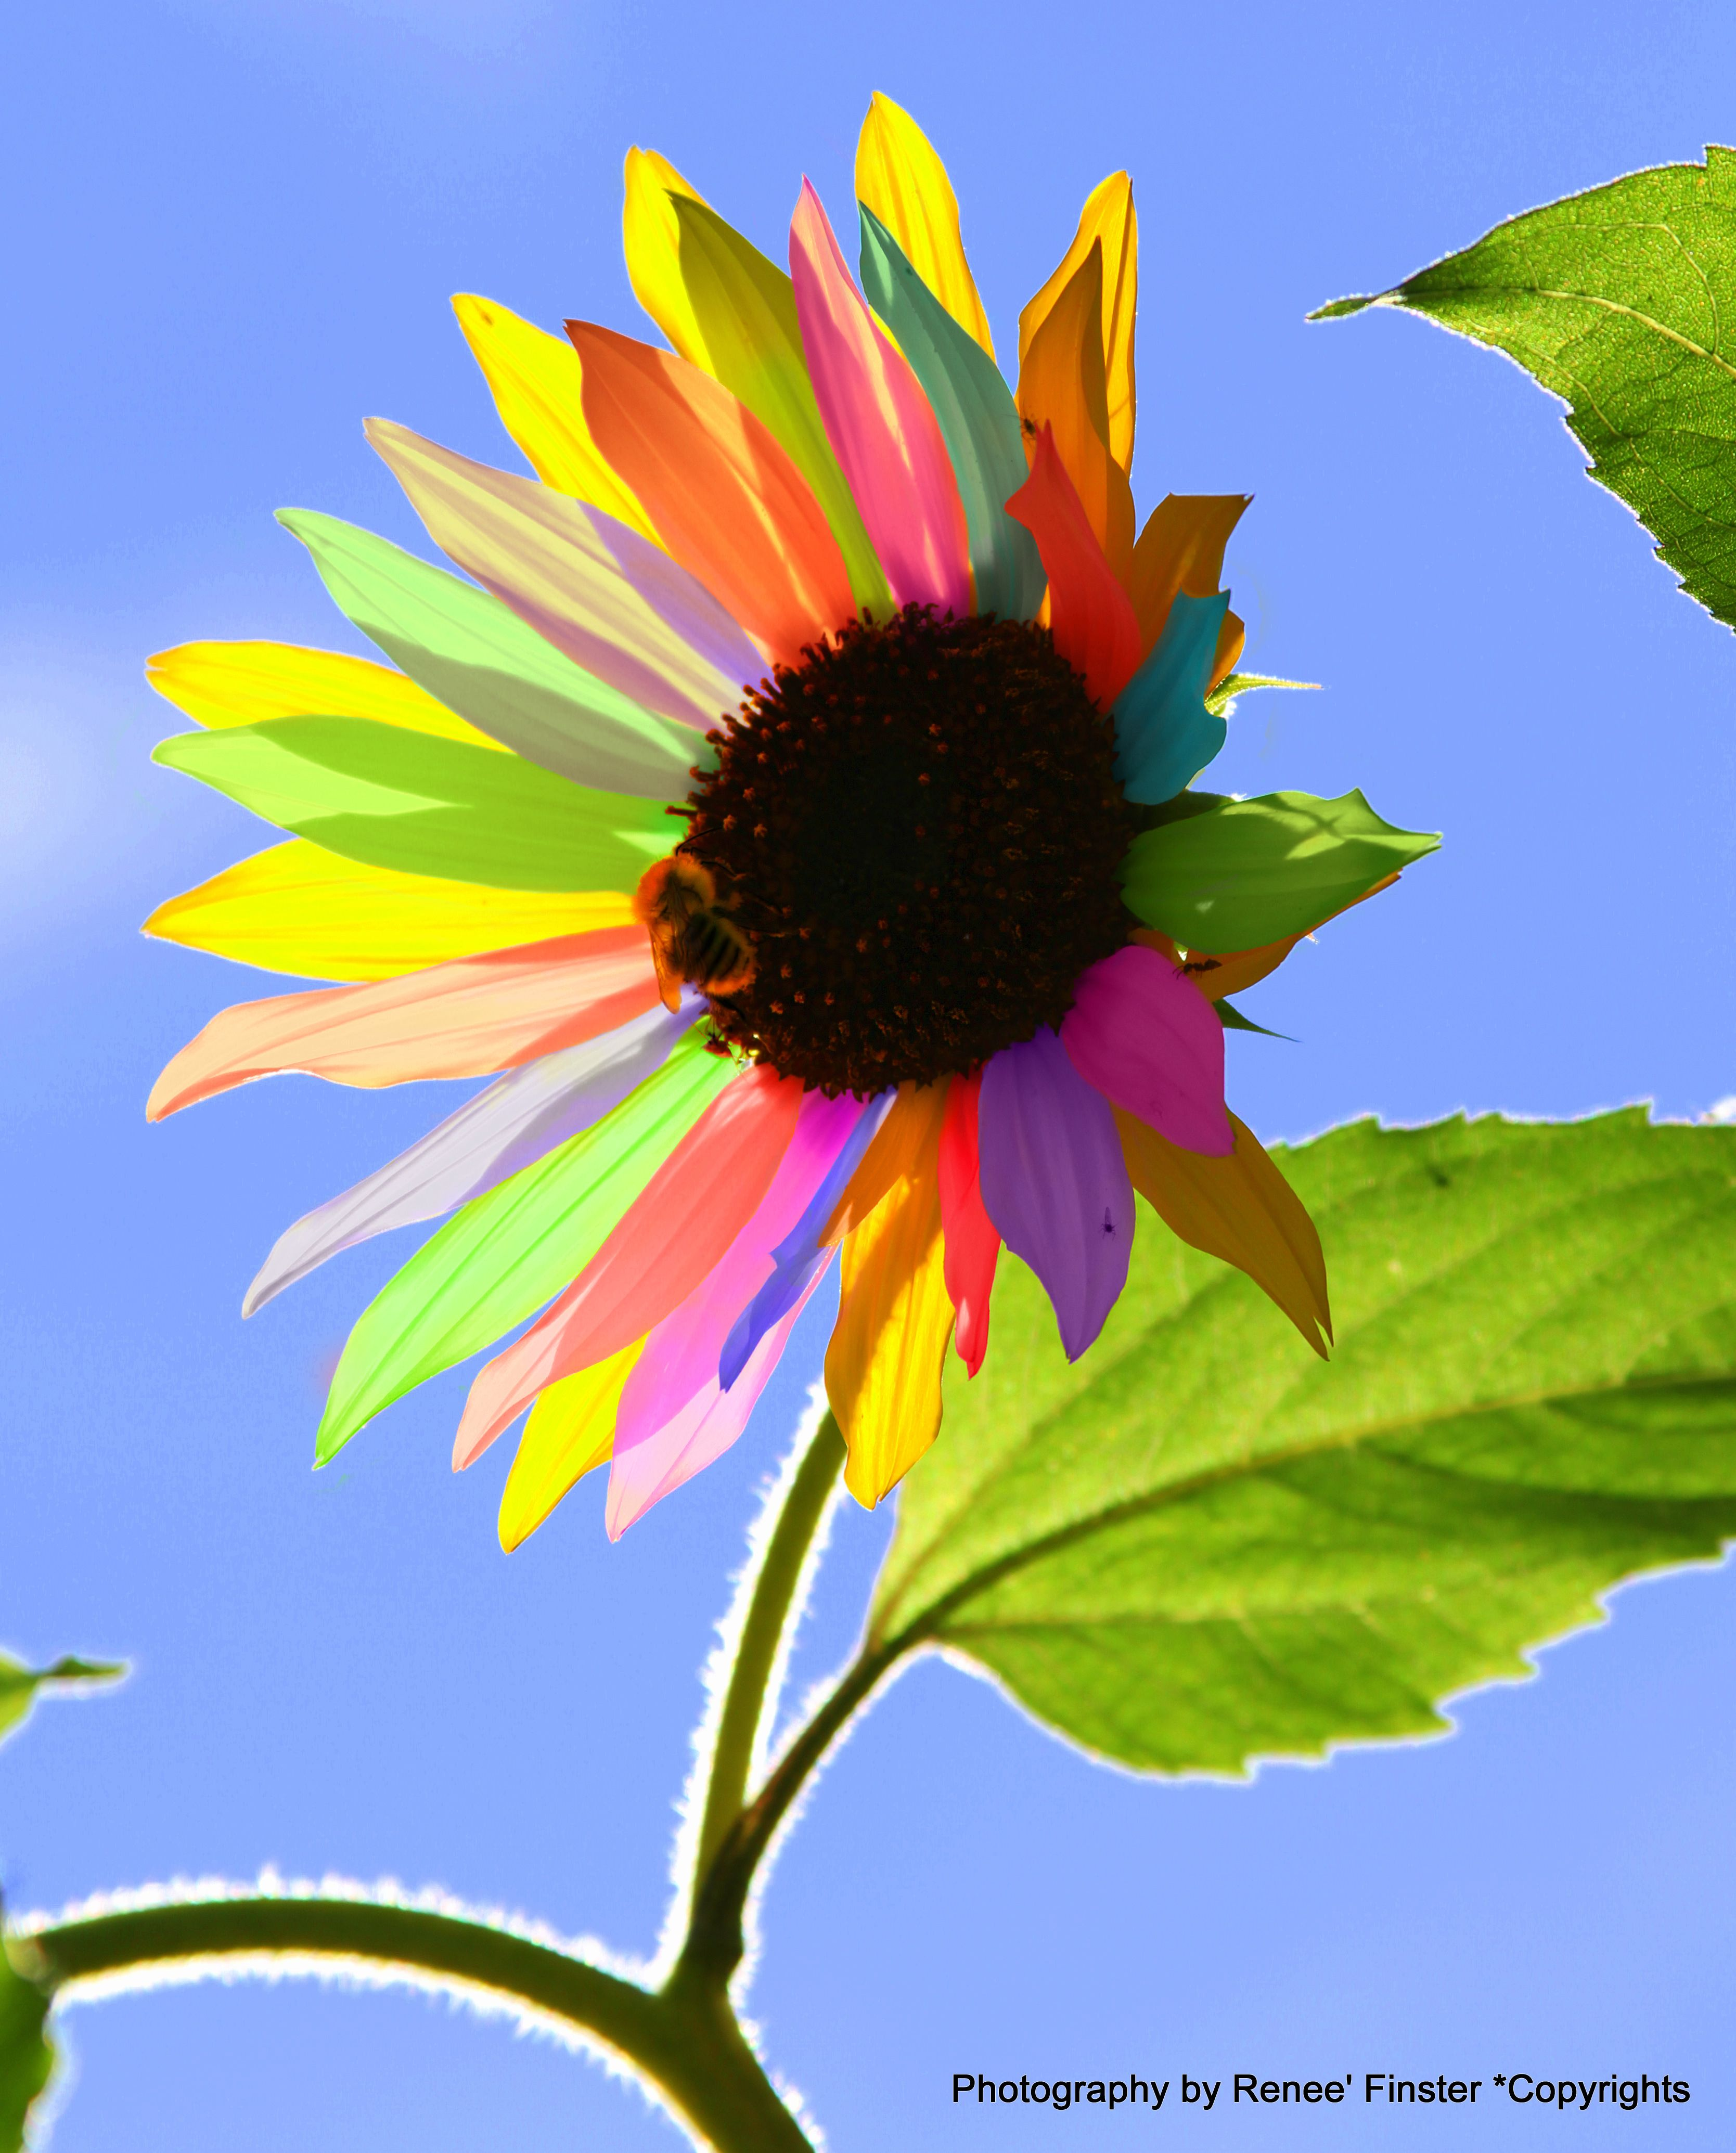 Iphone Rainbow Sunflower Wallpaper